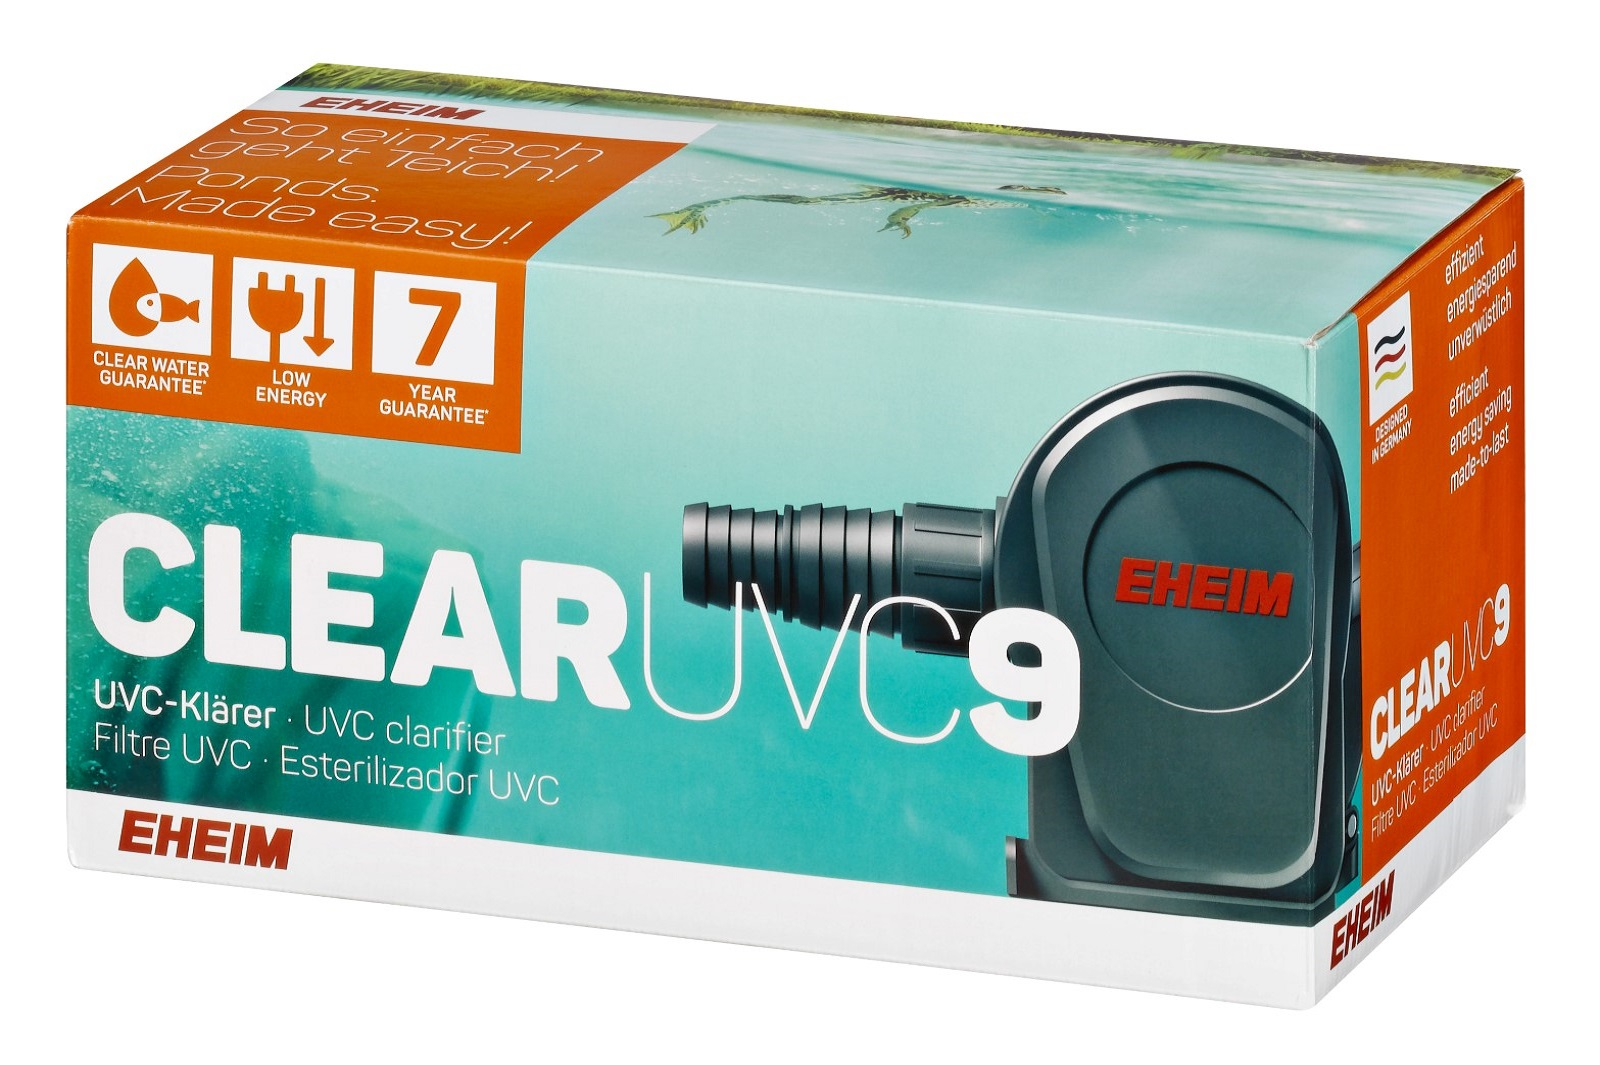 Eheim Clear UVC-9  UVC-Klärer